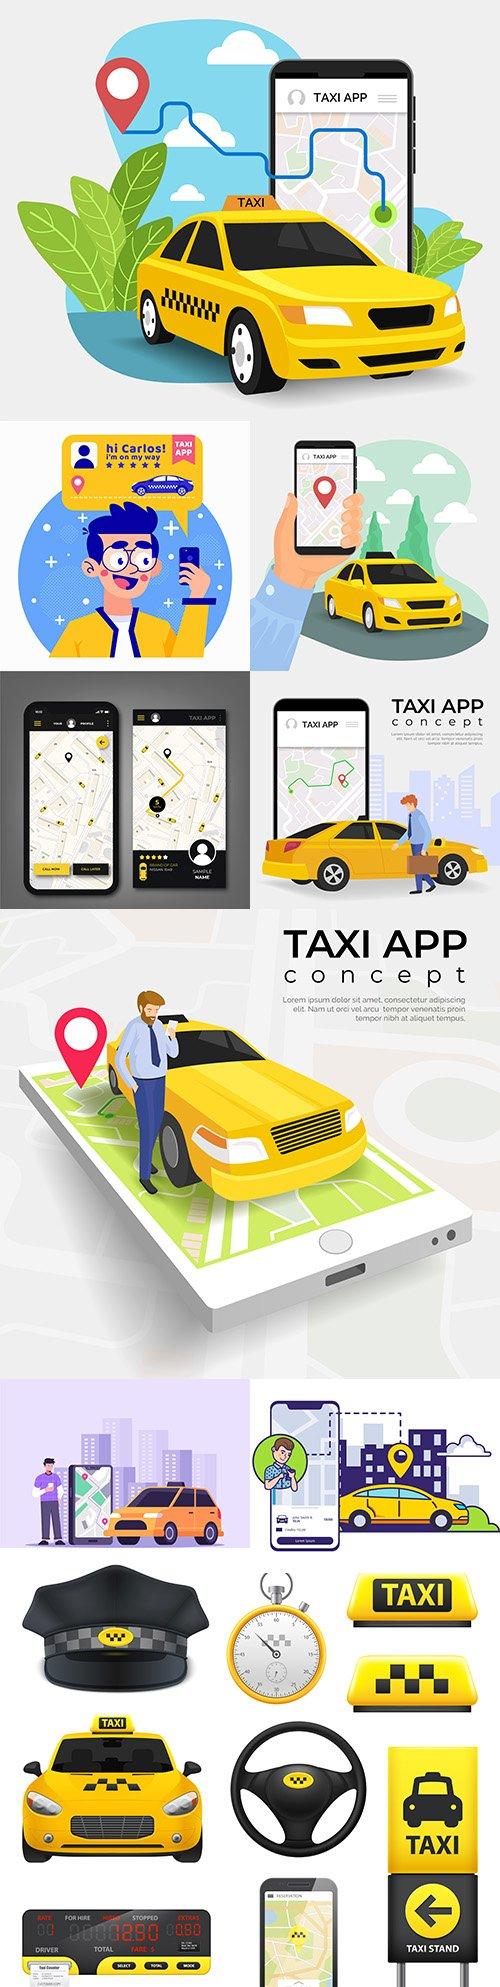 Taxi concept application service illustration design